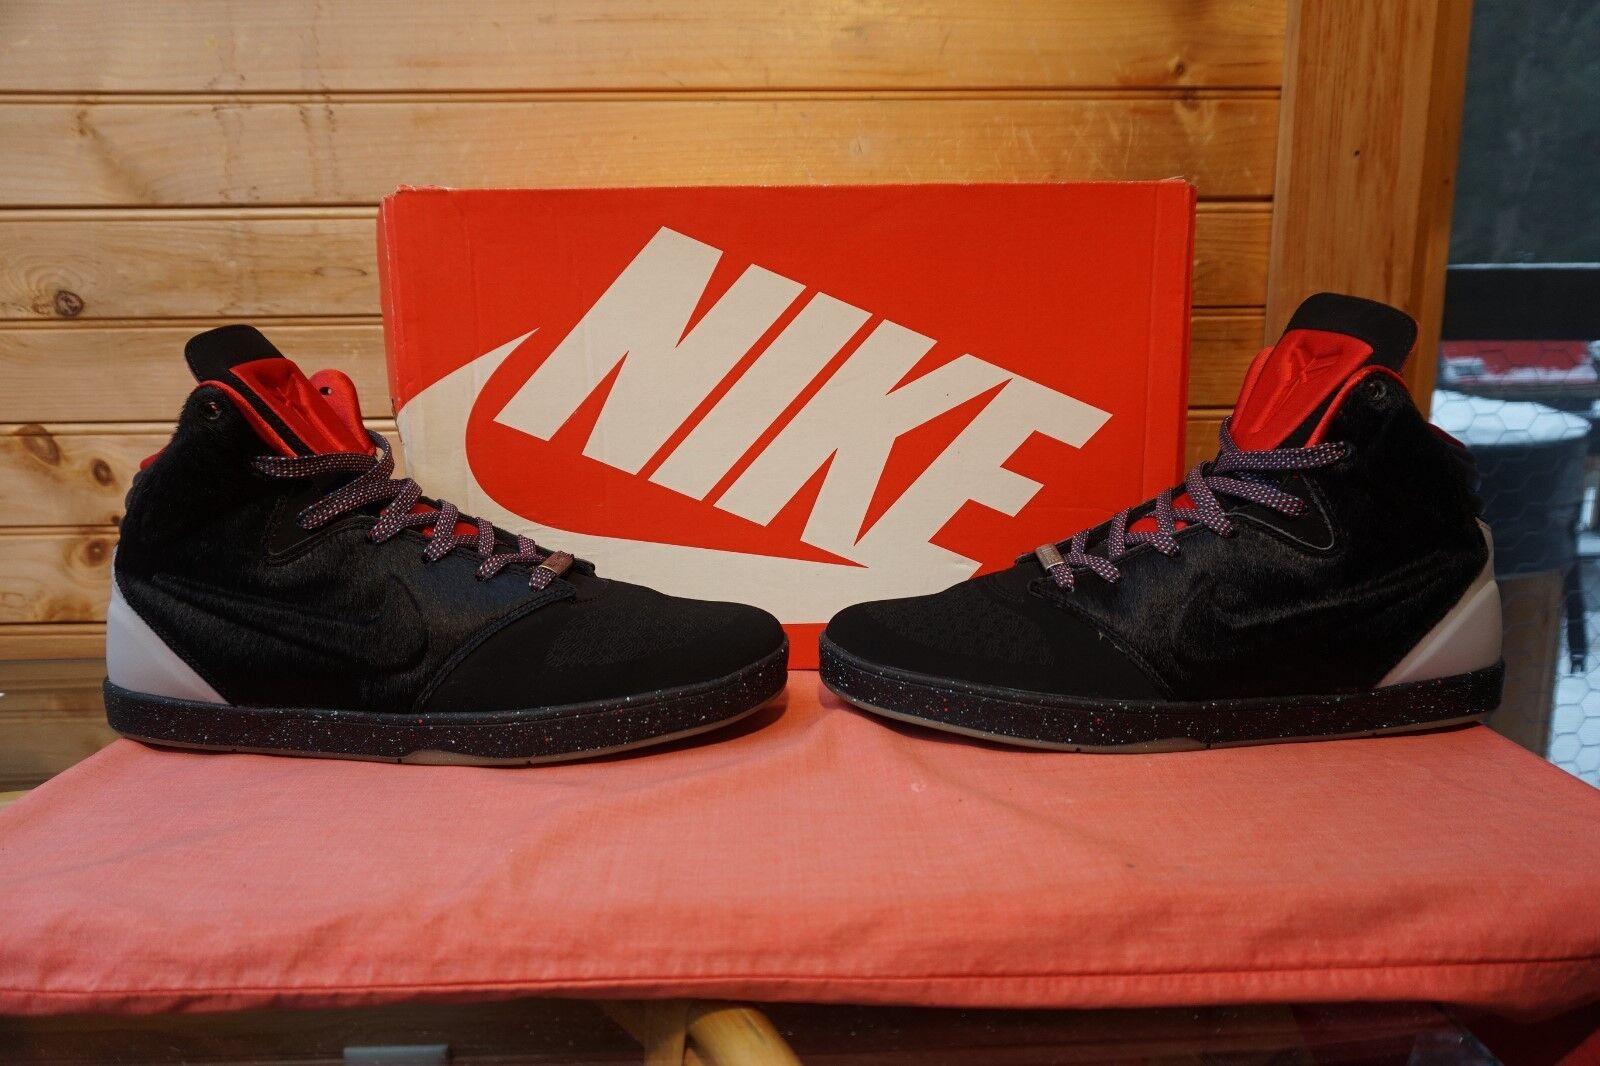 2013 Nike Kobe 9 NSW Lifestyle YOH QS Sz 13 (0949) 647594-001